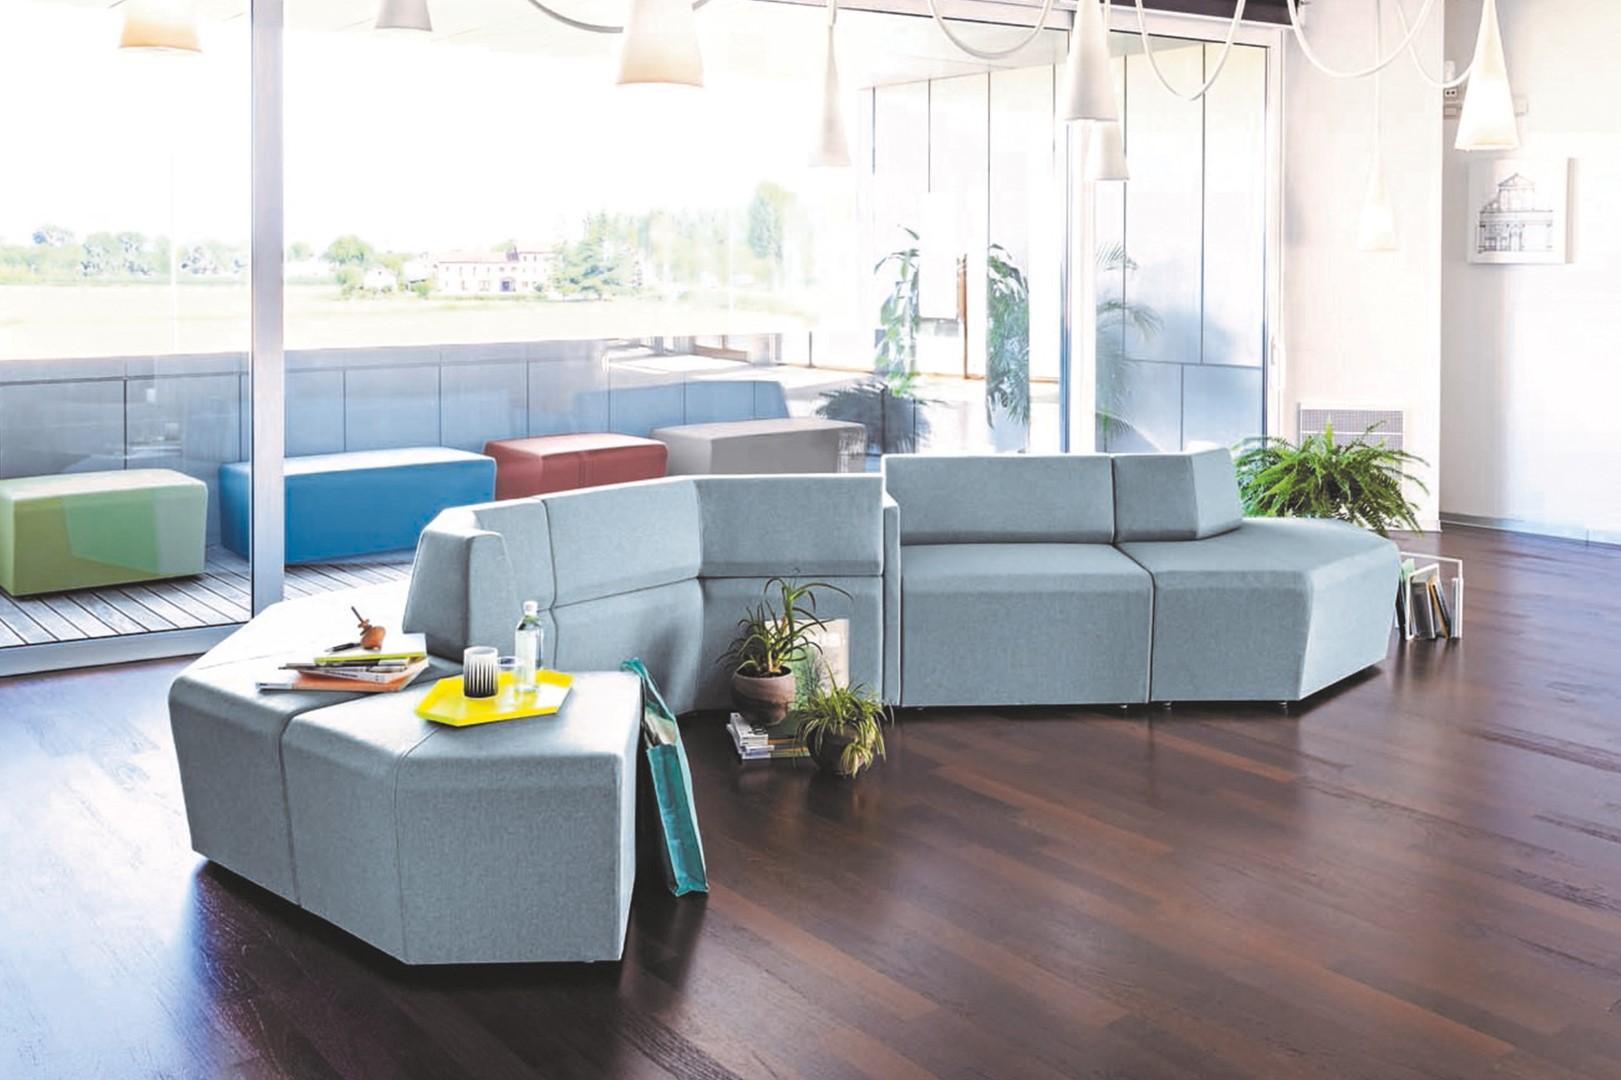 furniture_0021_7.sofa (1)